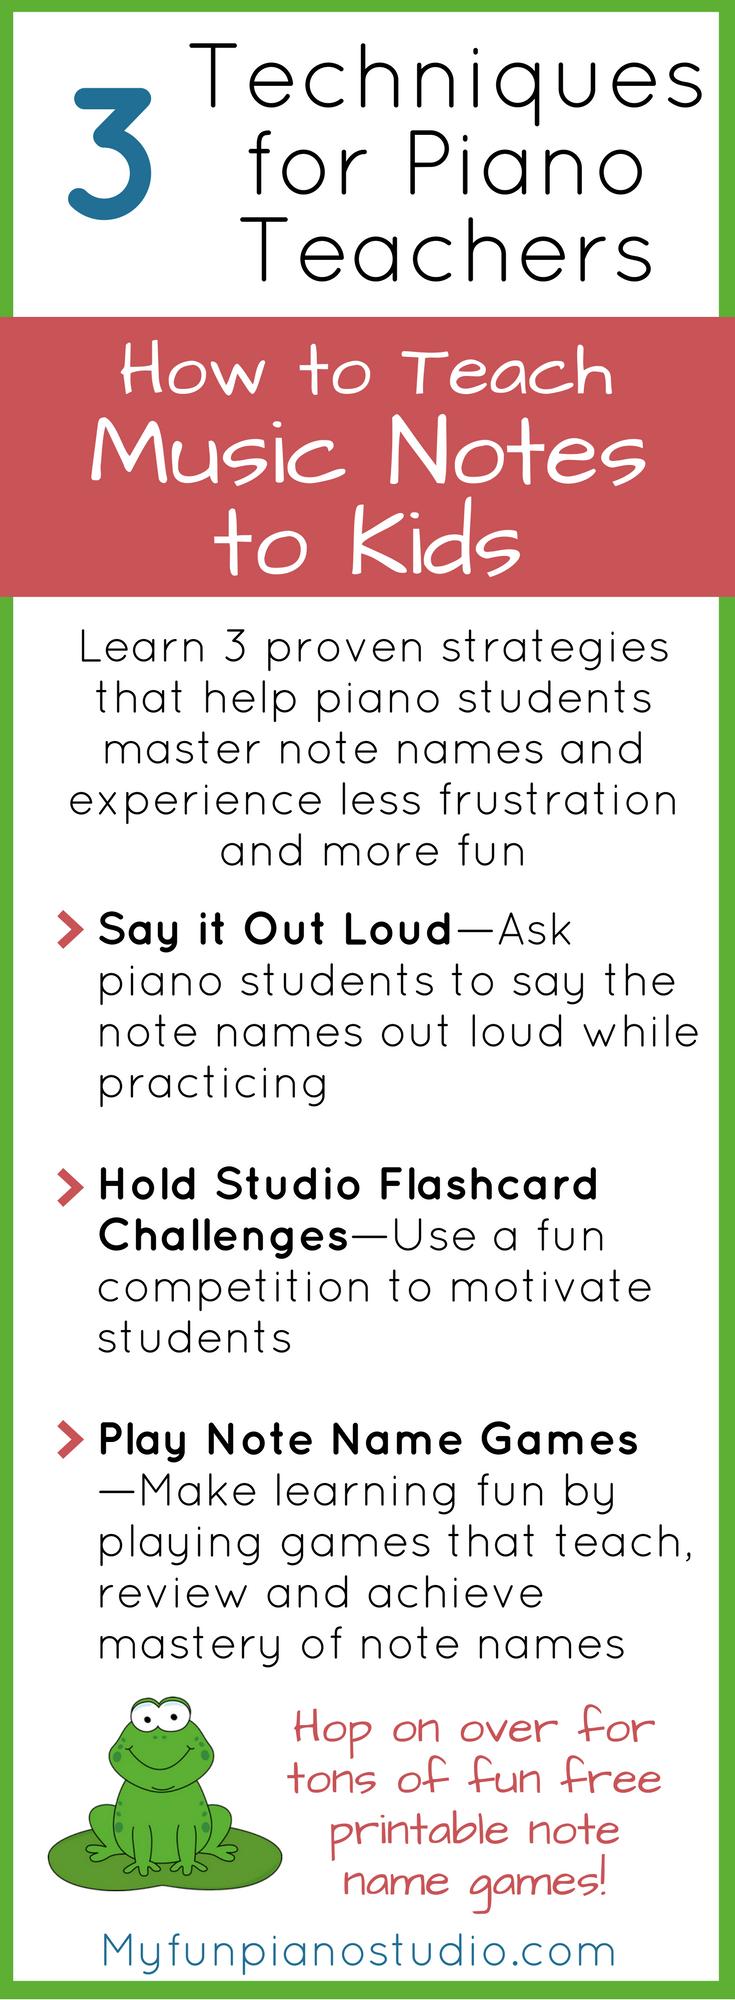 Teaching Music Notes